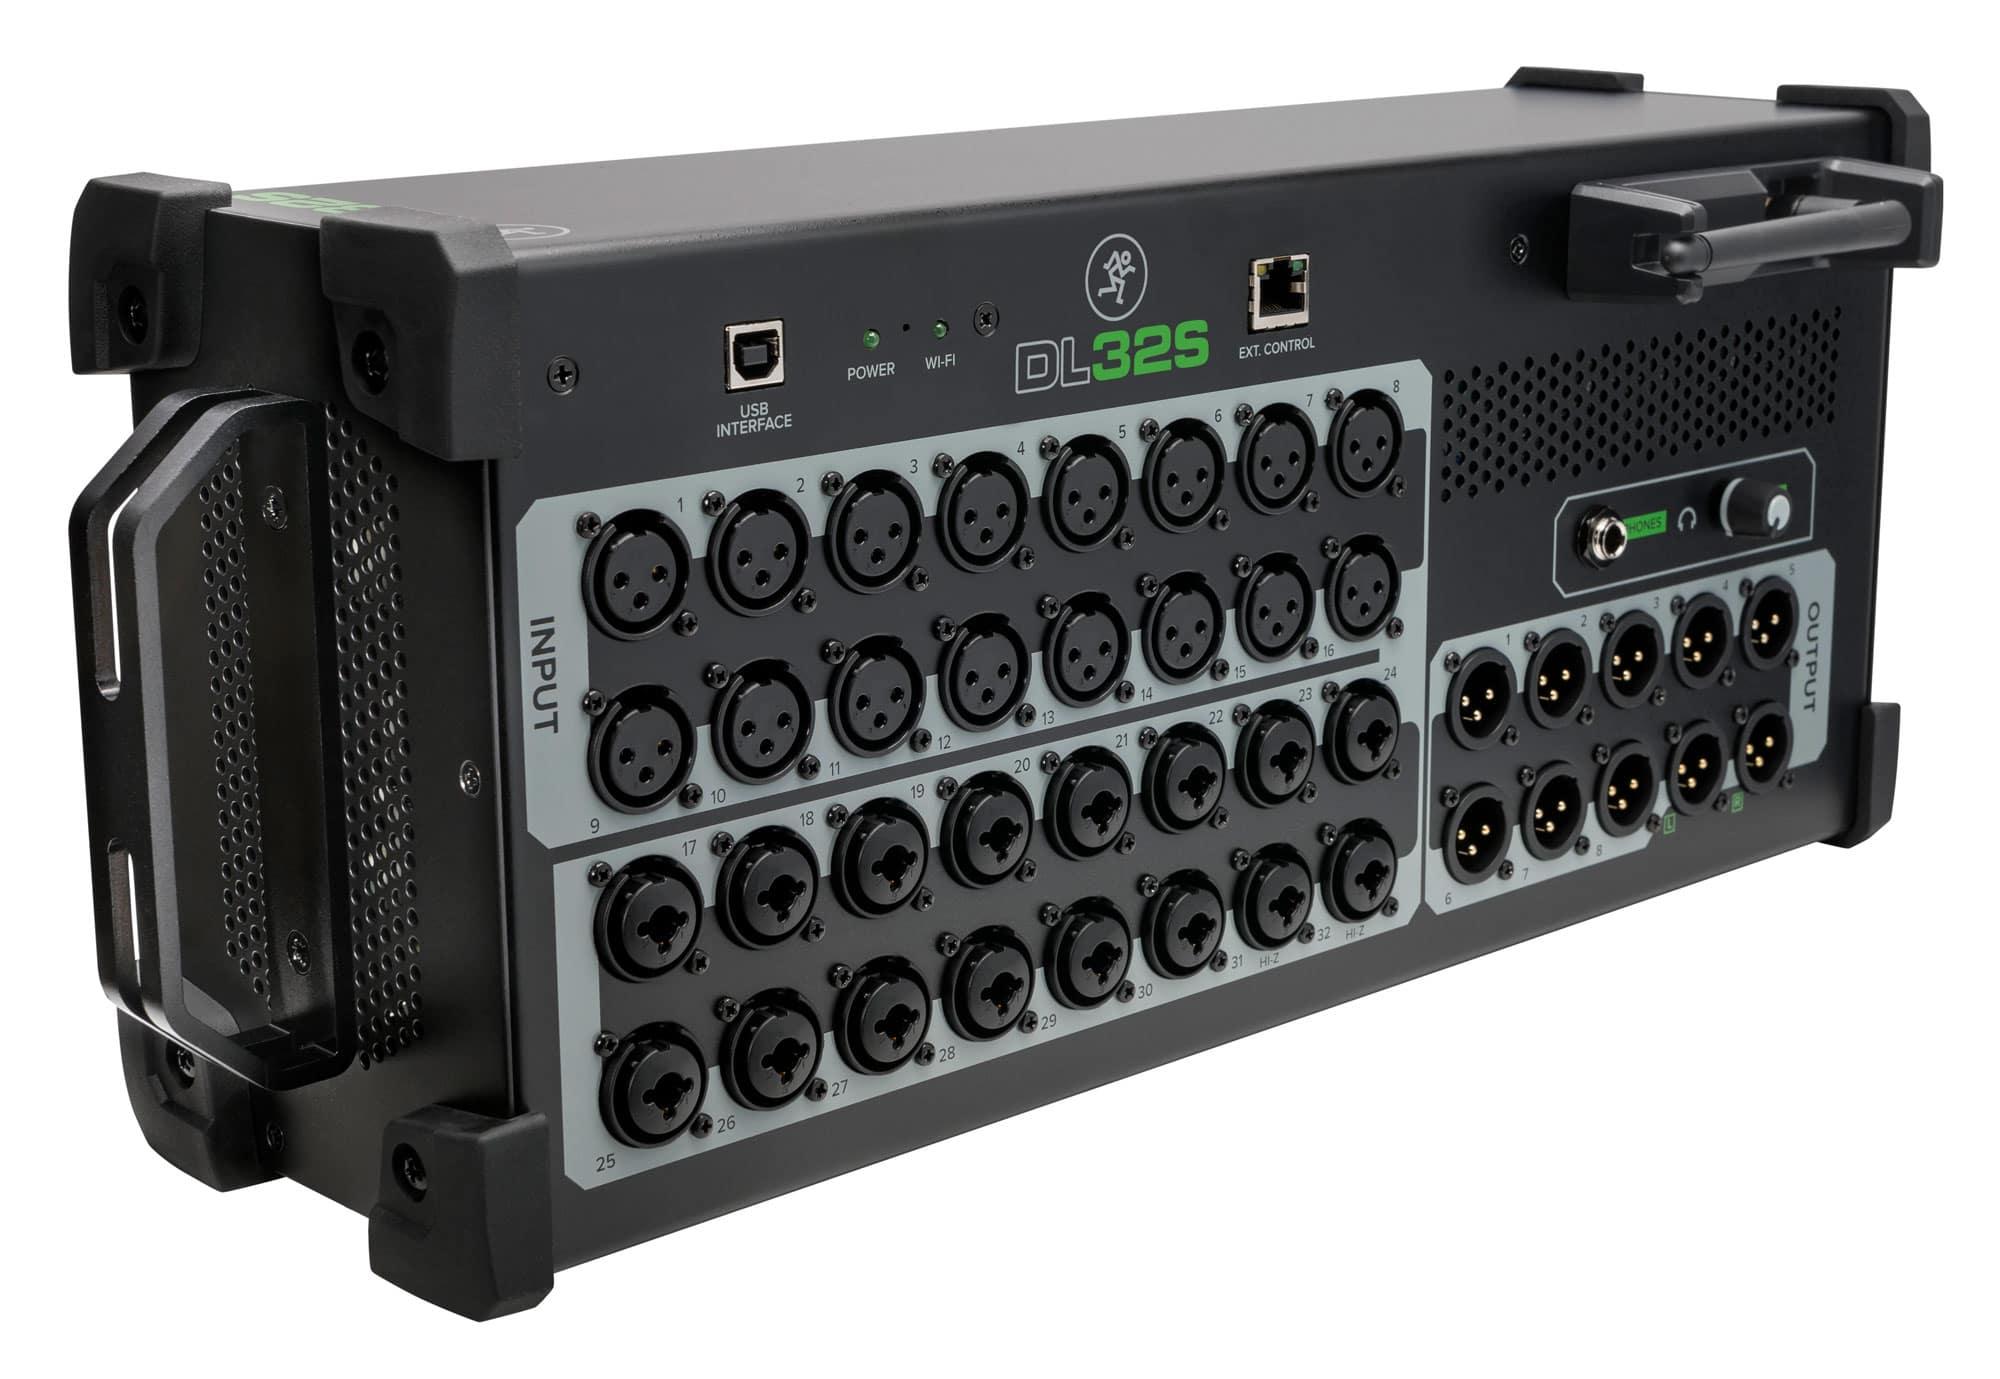 Mikrofone - Mackie DL32S 1A Showroom Modell (Zustand wie neu) - Onlineshop Musikhaus Kirstein